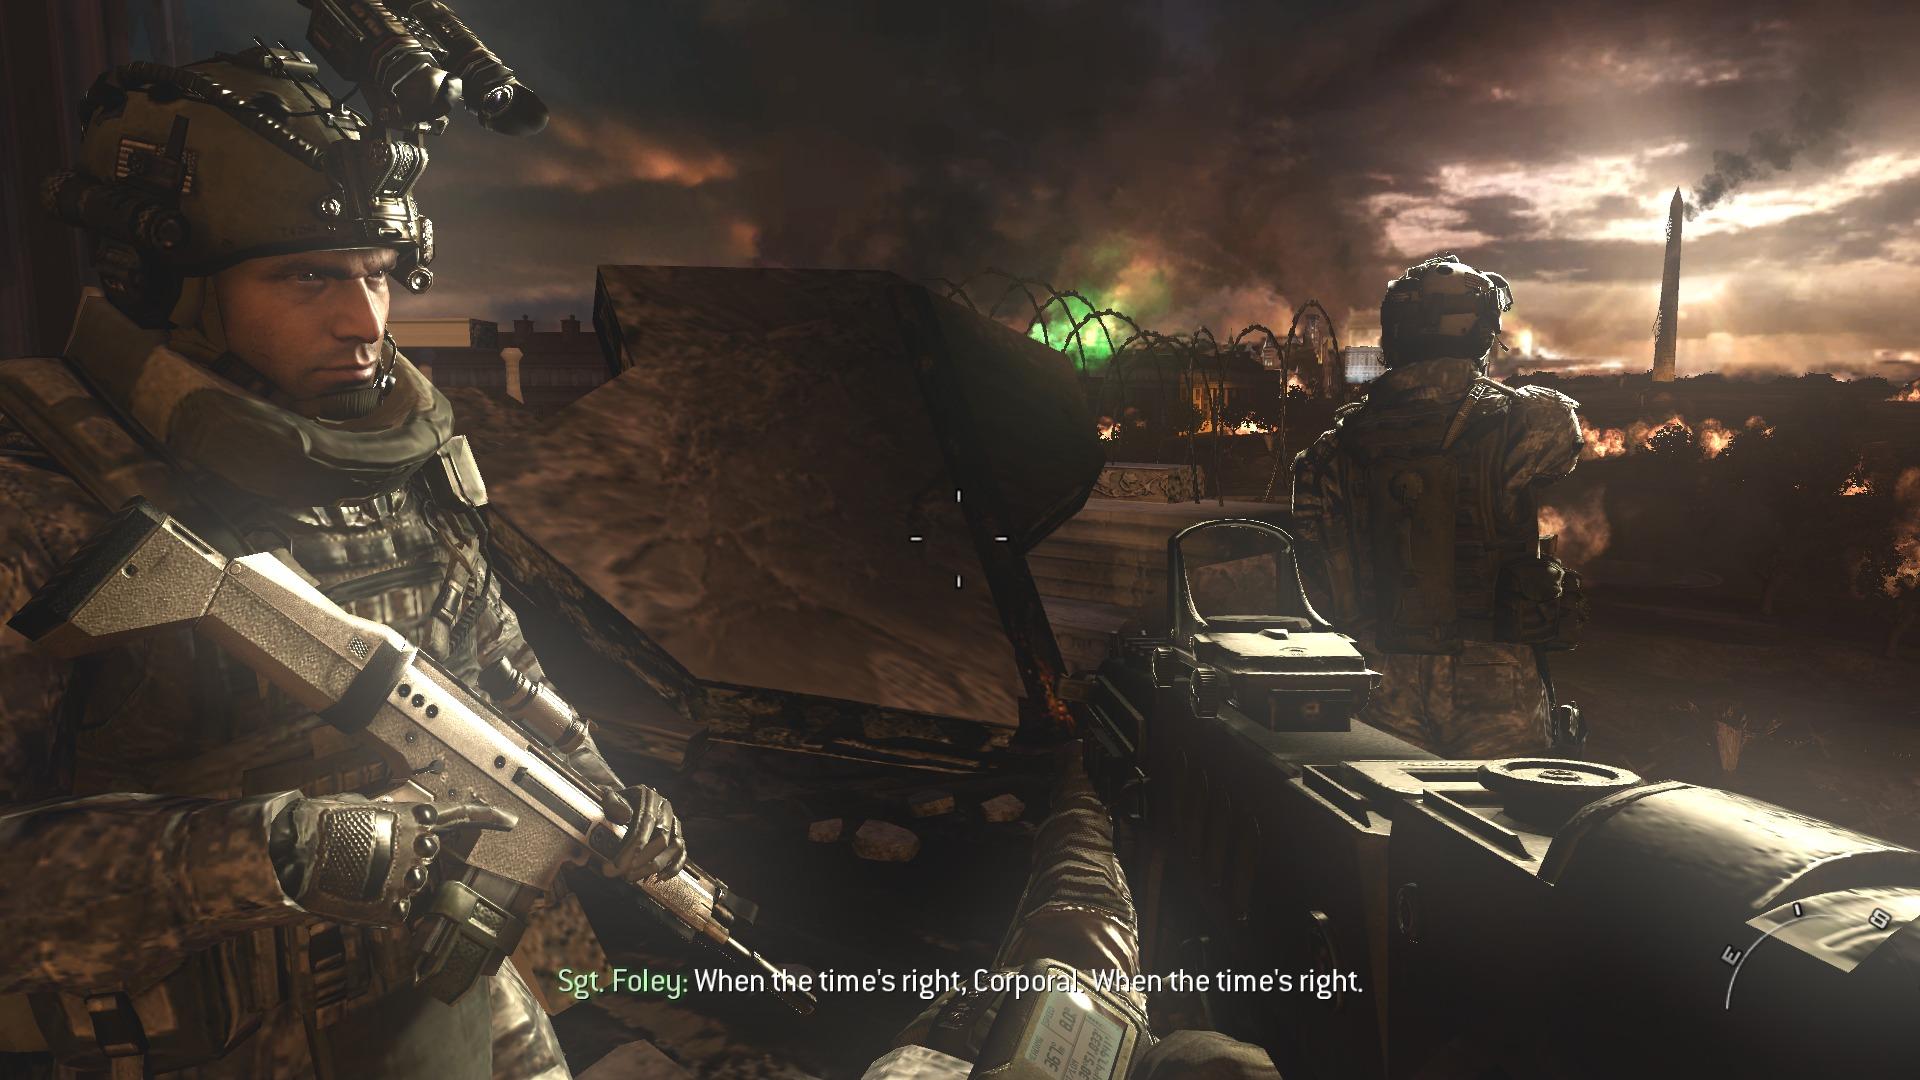 call of duty: modern warfare 2 screenshots - image #870   new game